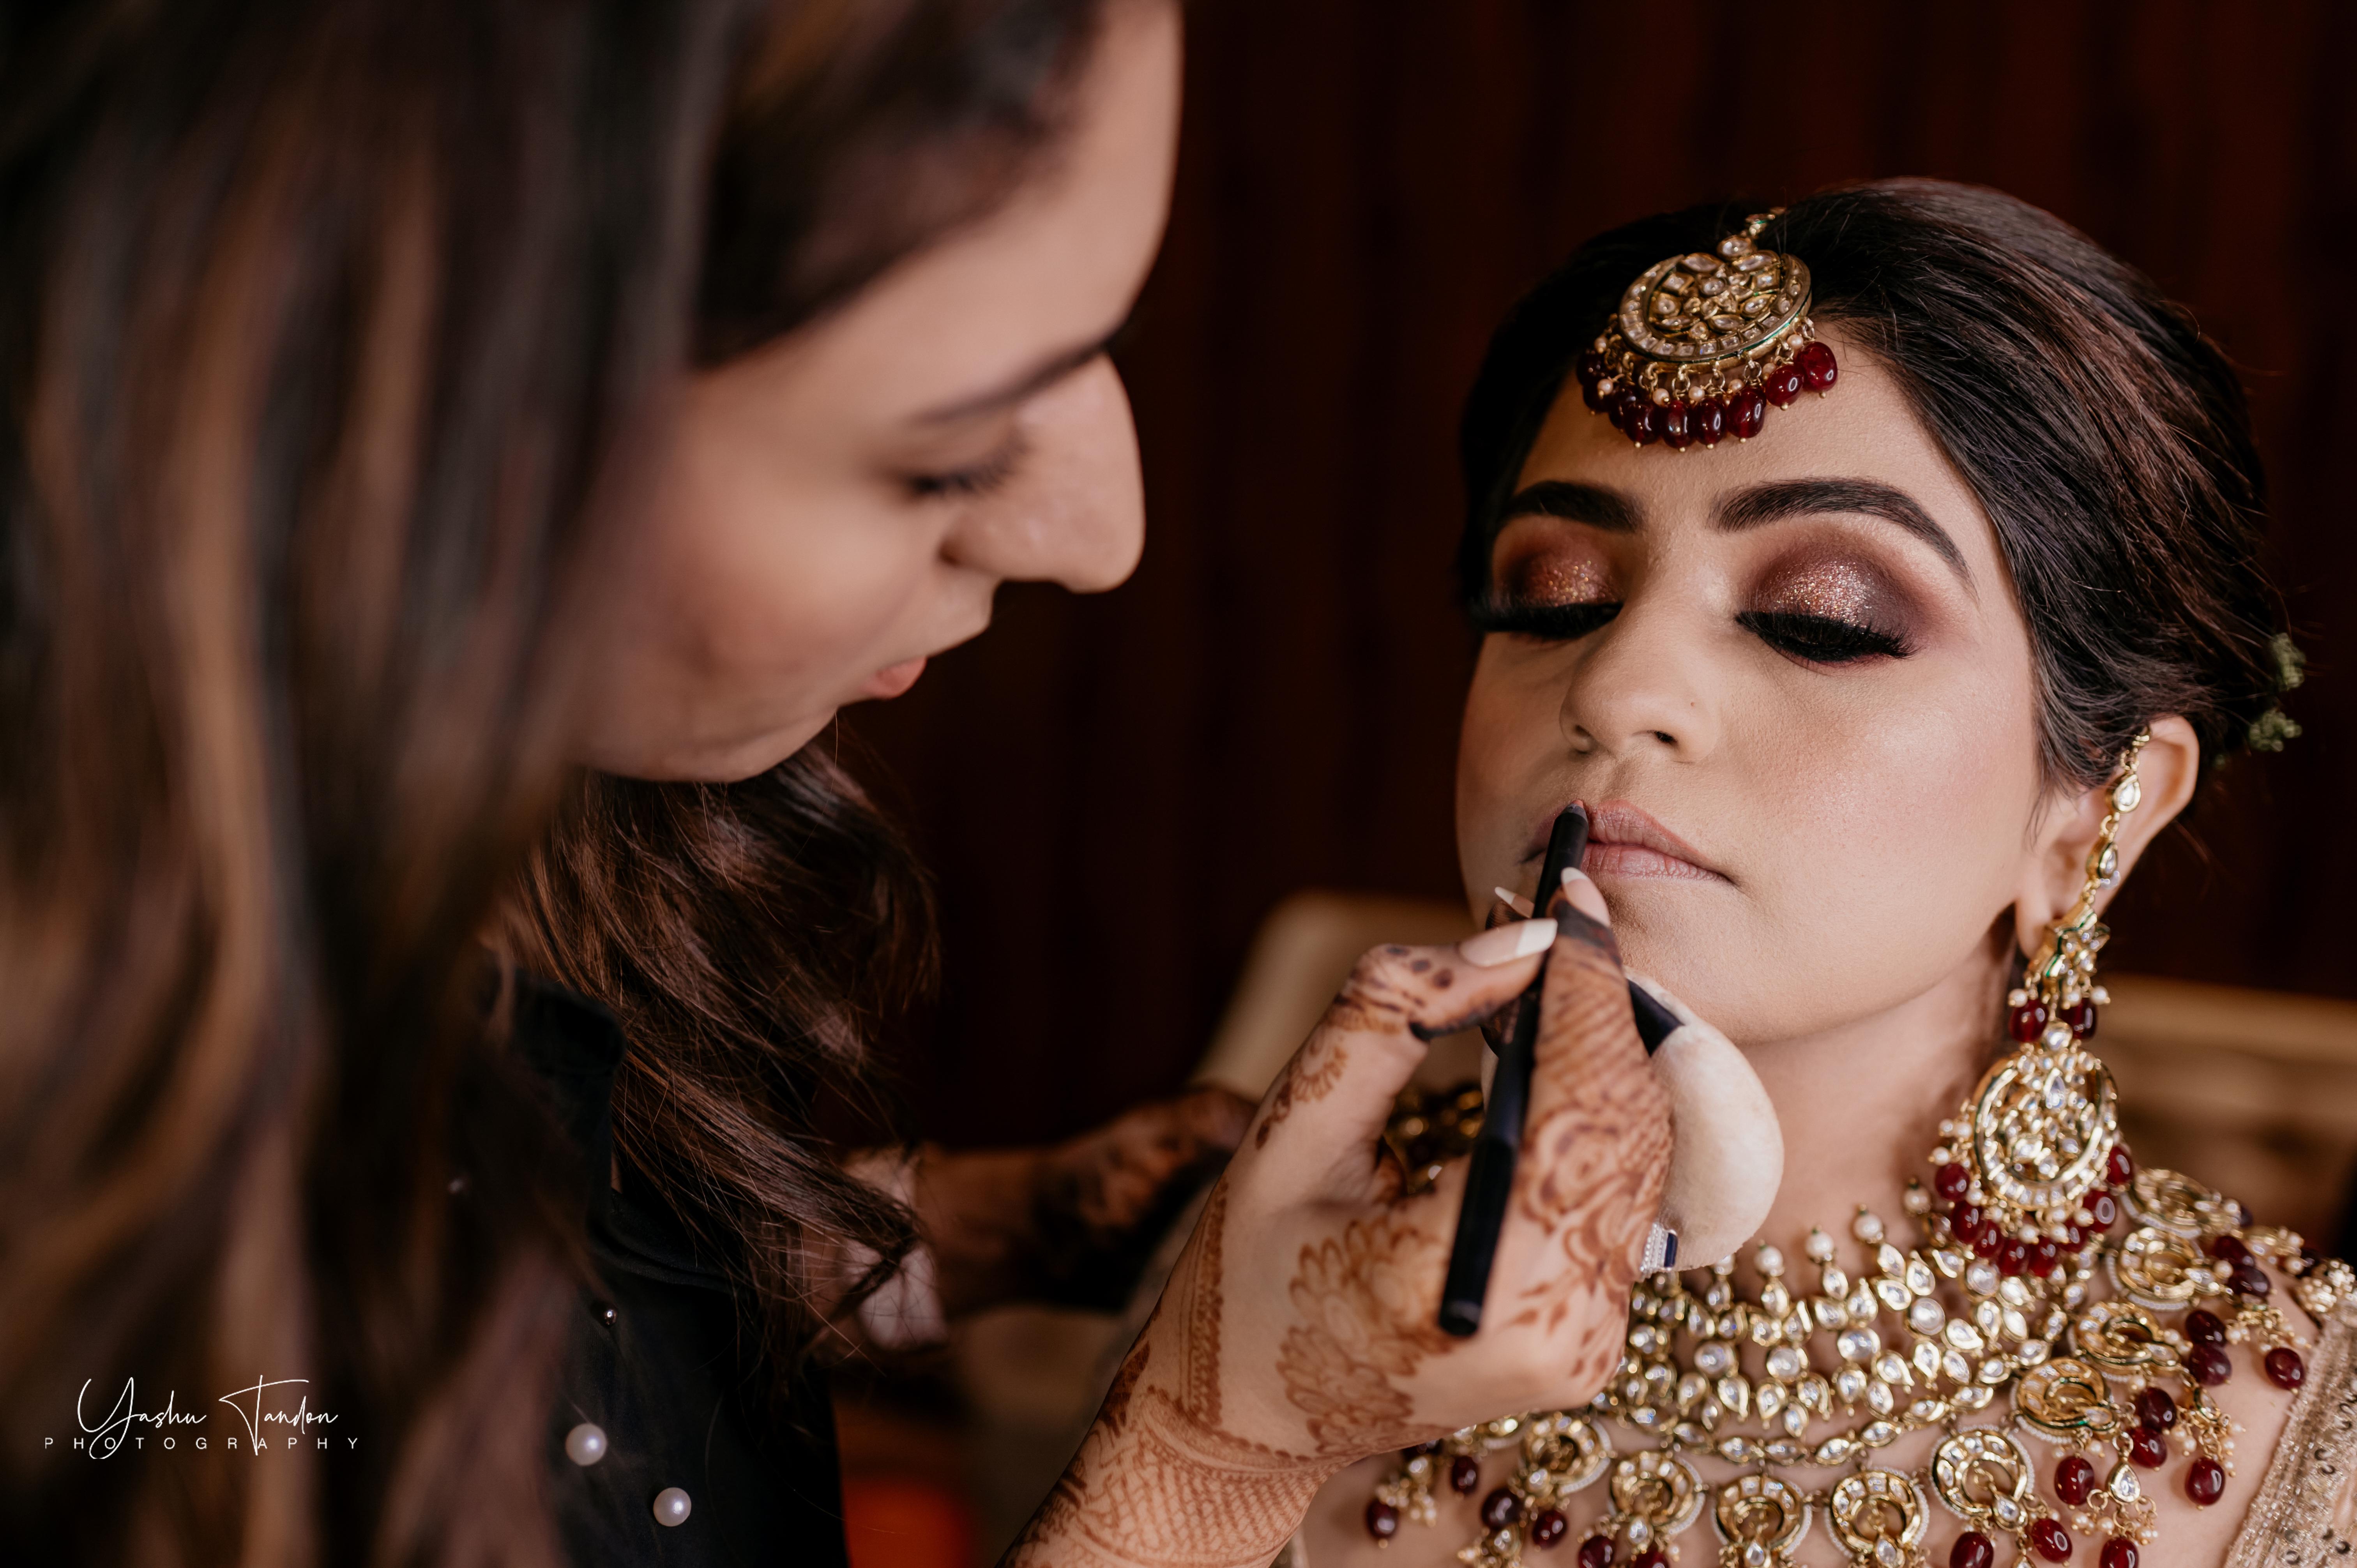 Best Bridal Makeup looks for Minimalist Brides